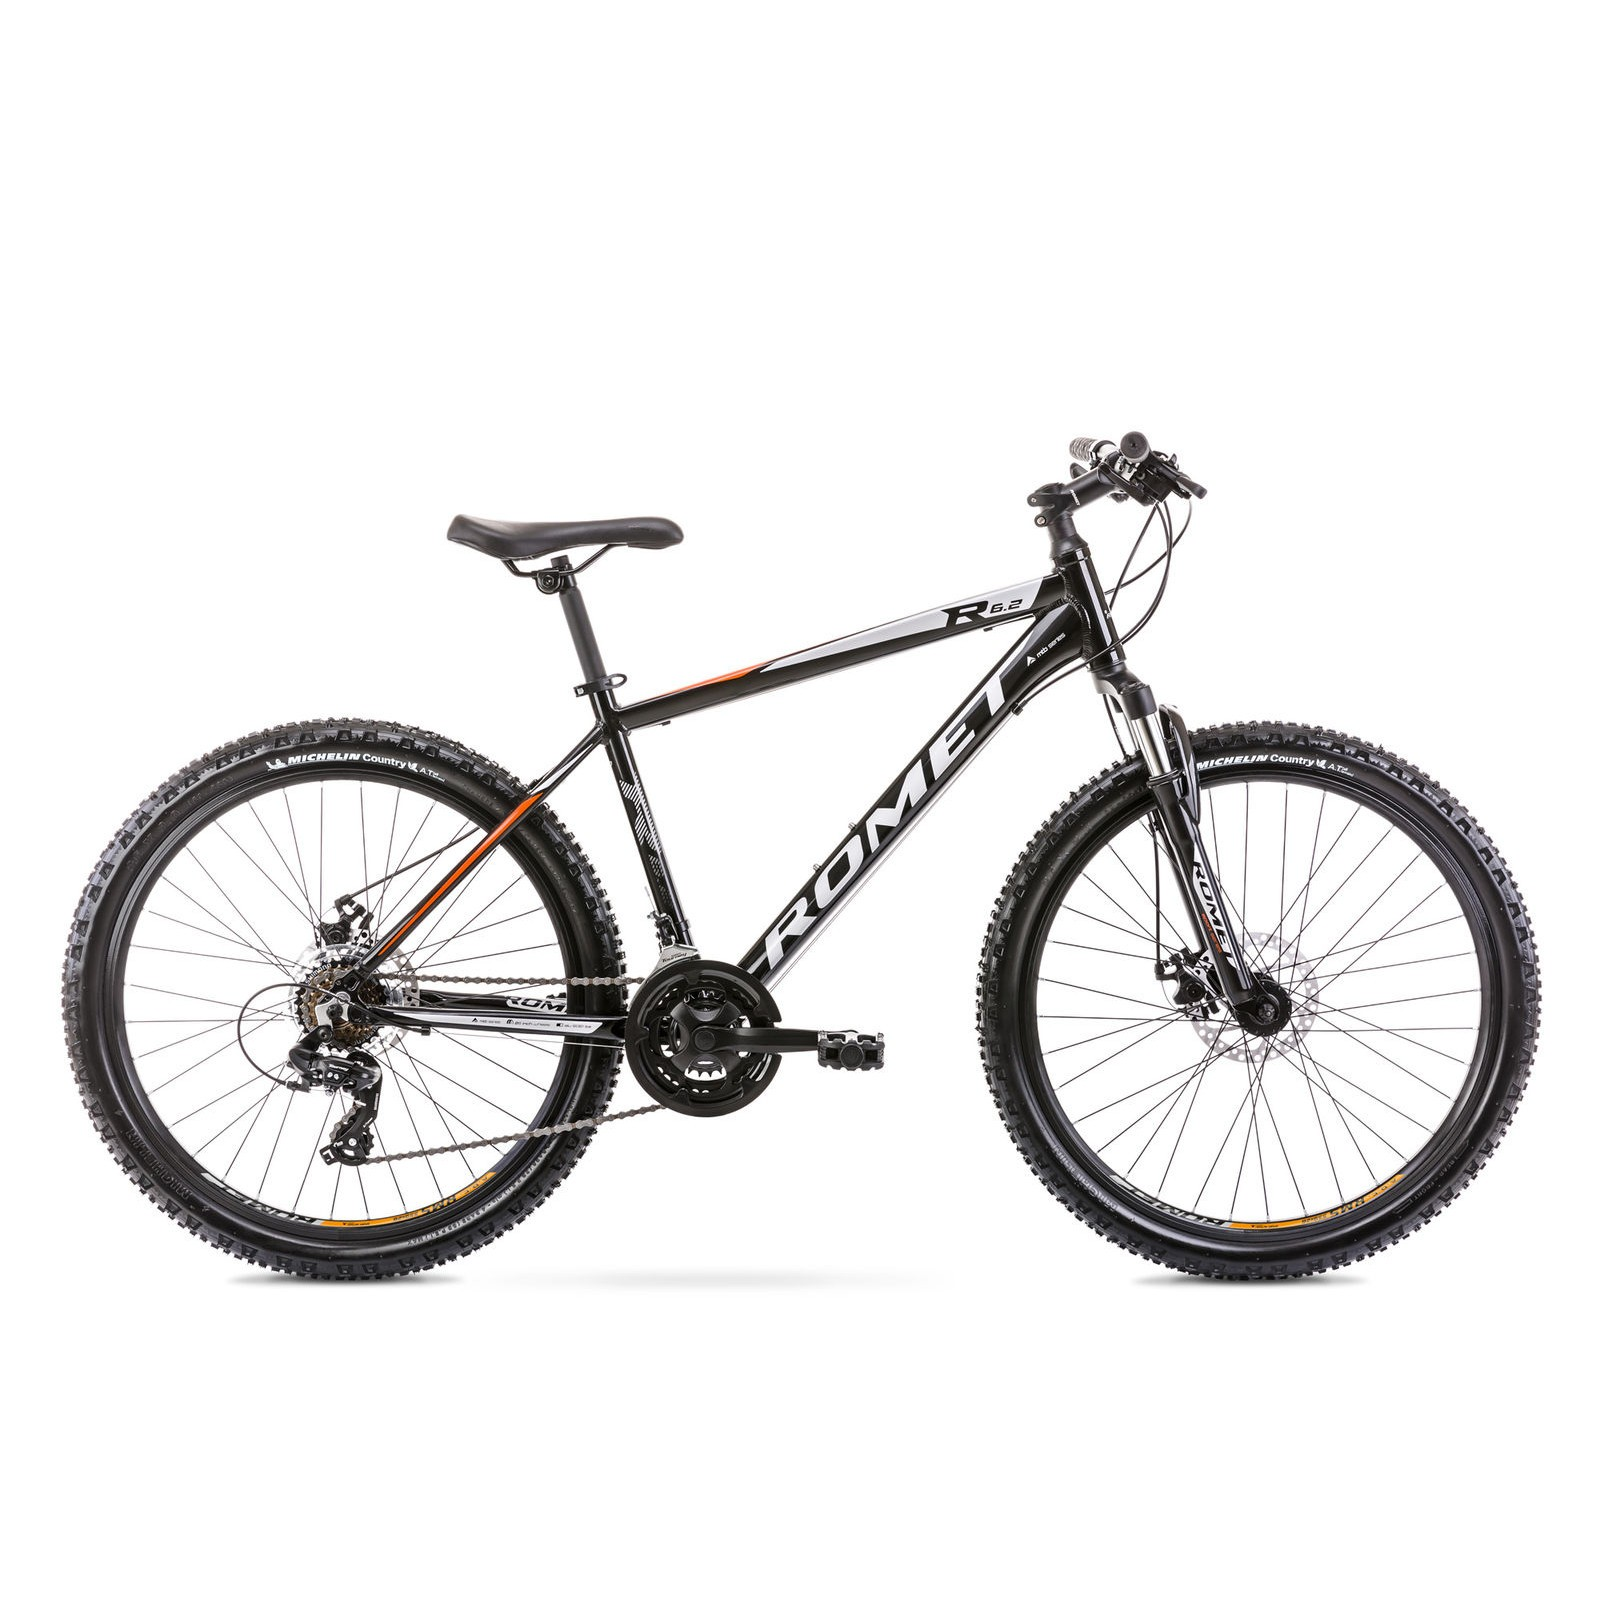 Cautare ieftina de biciclete de munte